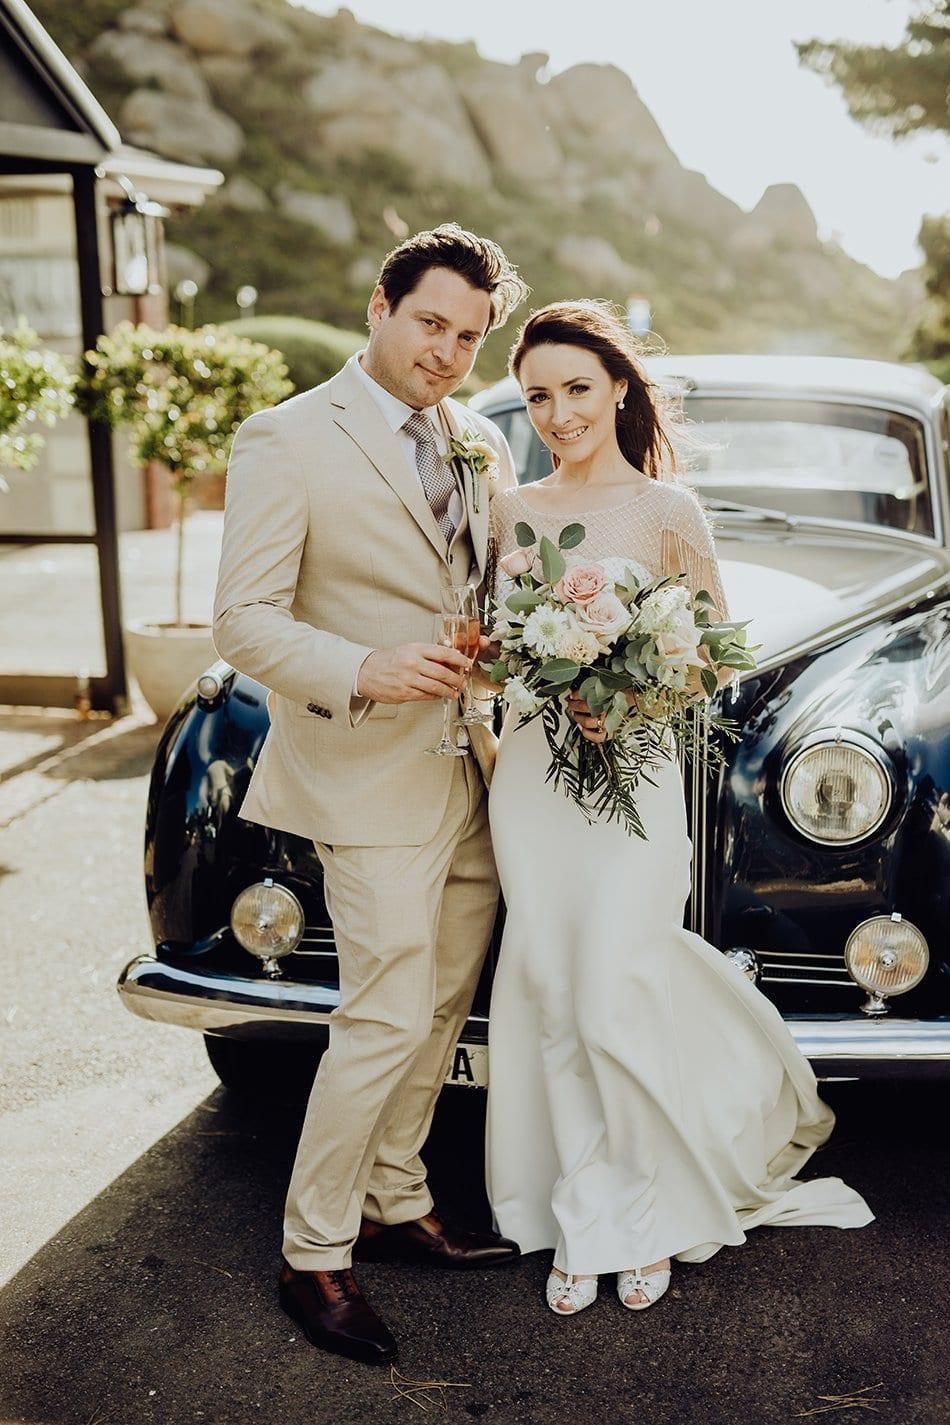 suikerbossie wedding venue hout bay - cape town wedding photographers - duane smith photography - wedding packages - somerset west wedding photographers (58)